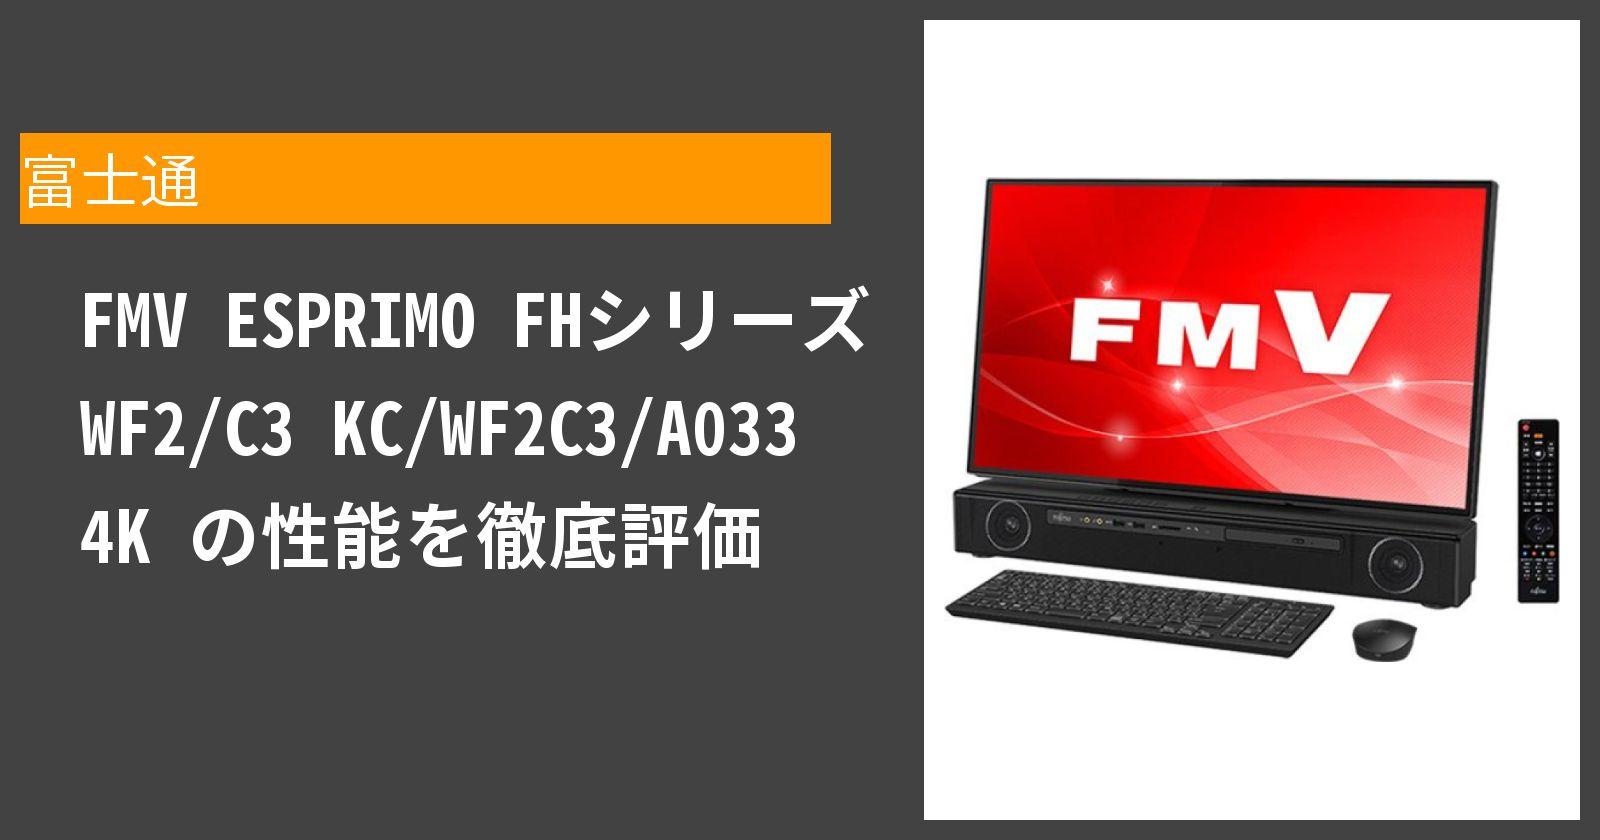 FMV ESPRIMO FHシリーズ WF2/C3 KC/WF2C3/A033 4K の性能を徹底評価